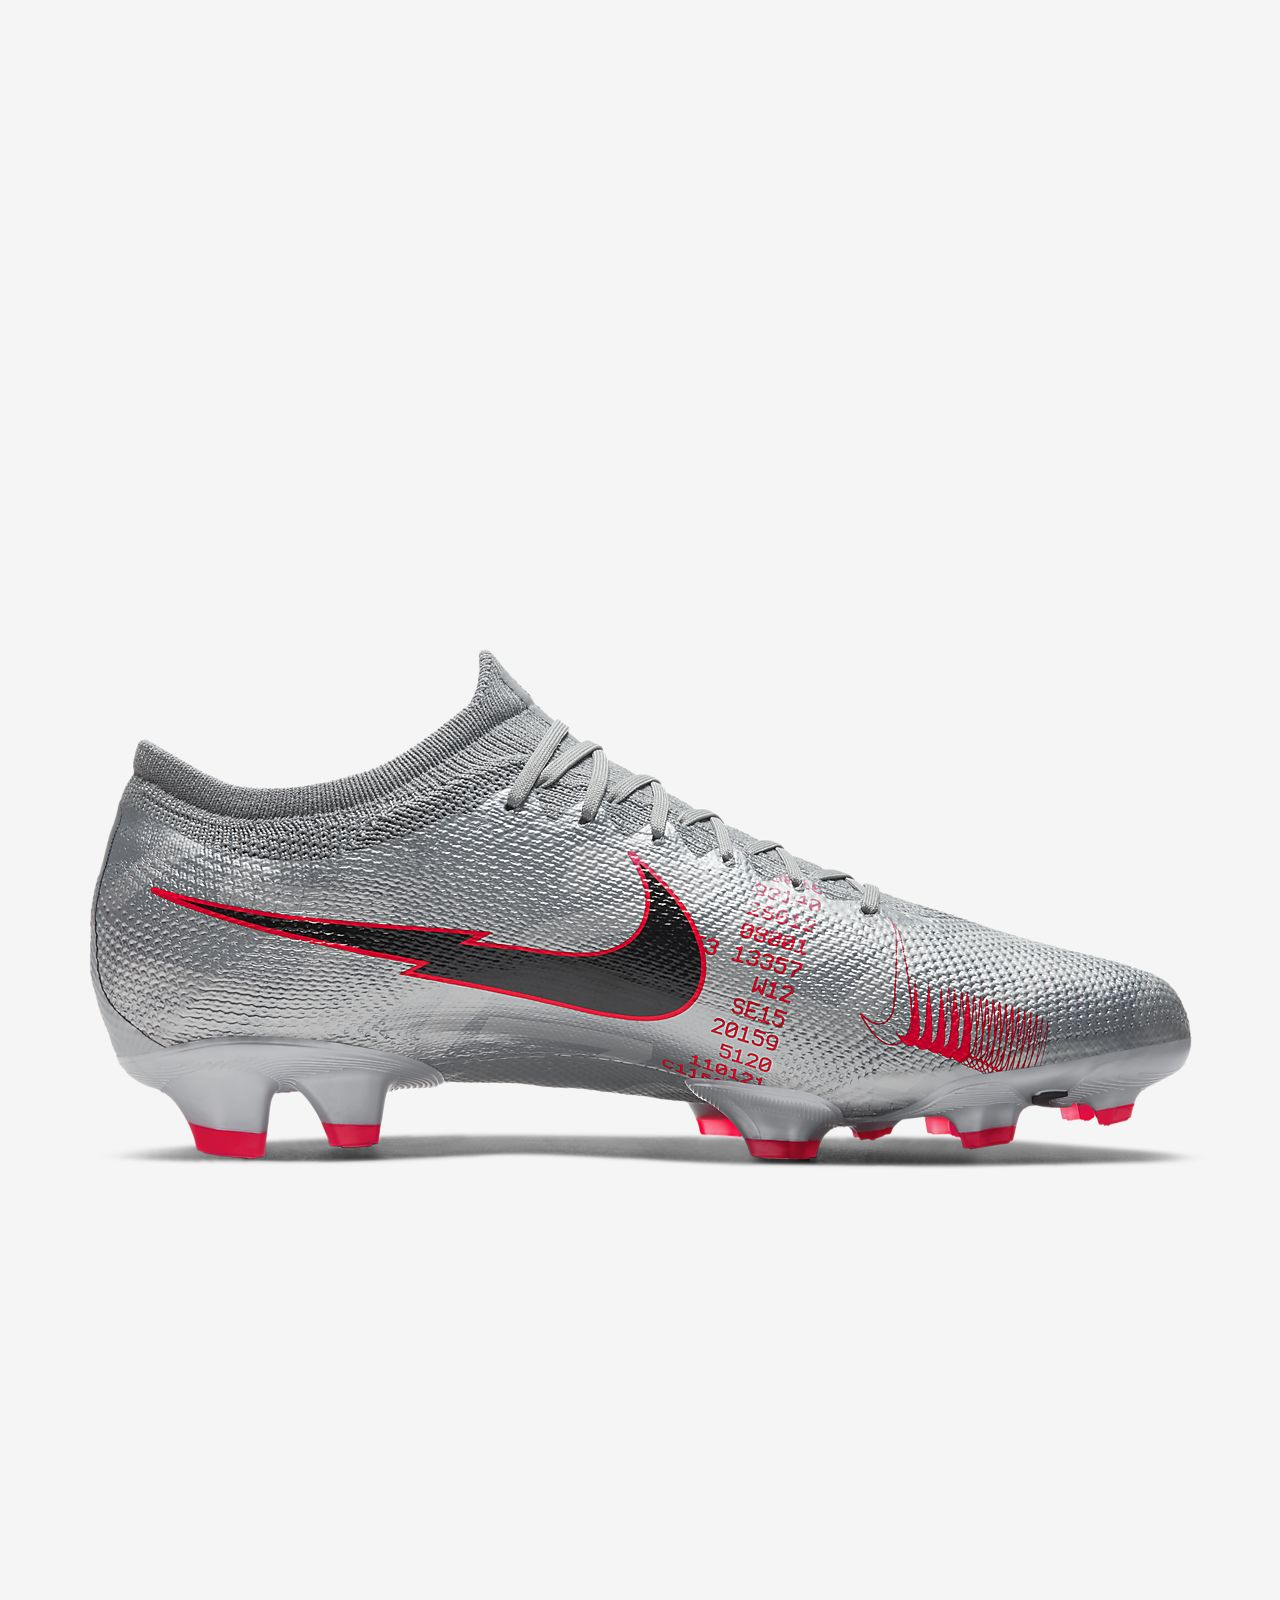 Nike Mercurial Vapor 13 Pro FG Fußballschuh für normalen Rasen